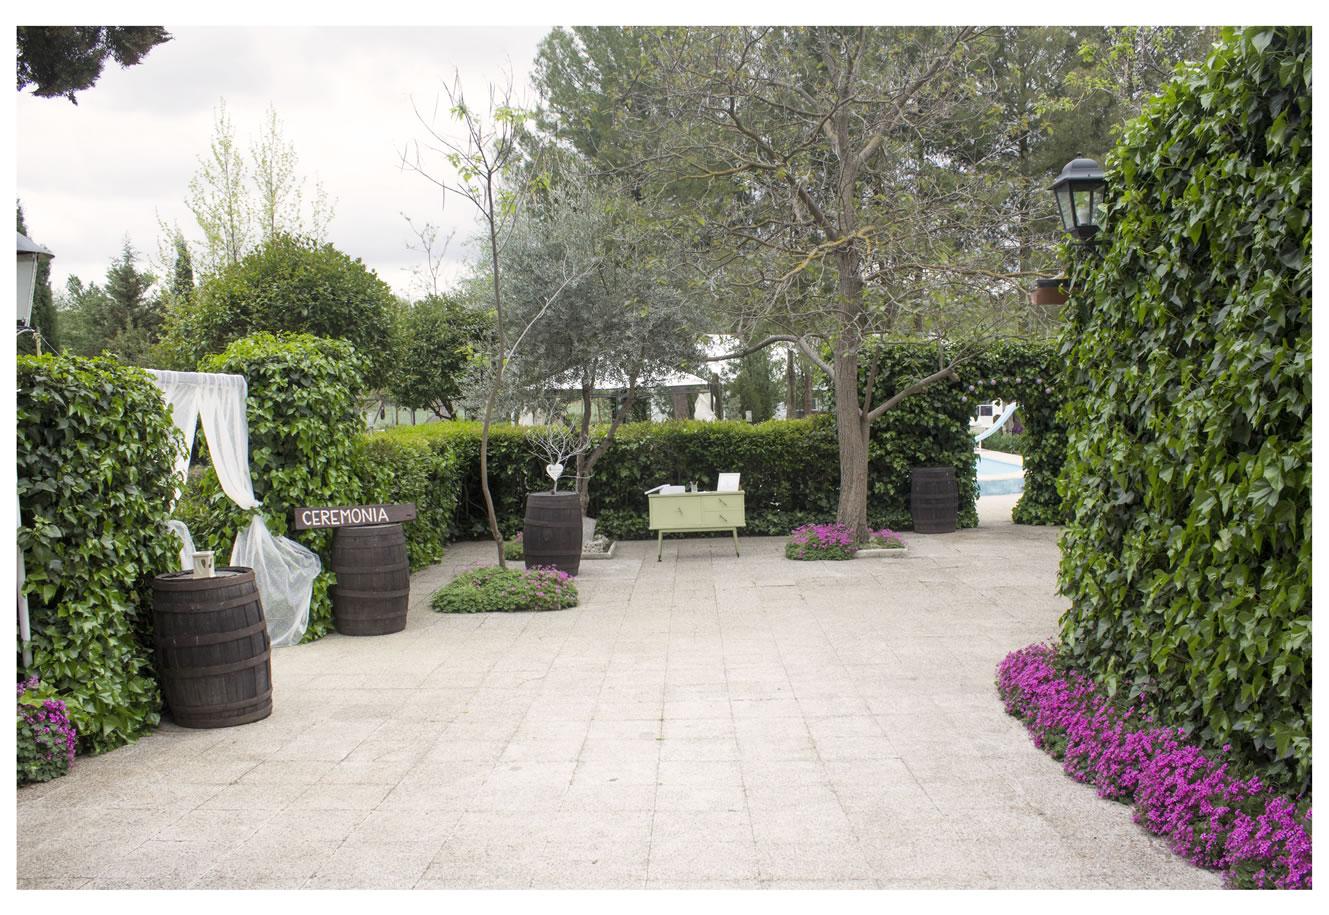 Fincas para bodas en madrid catering luc a joaqu n - Vivero aranjuez ...